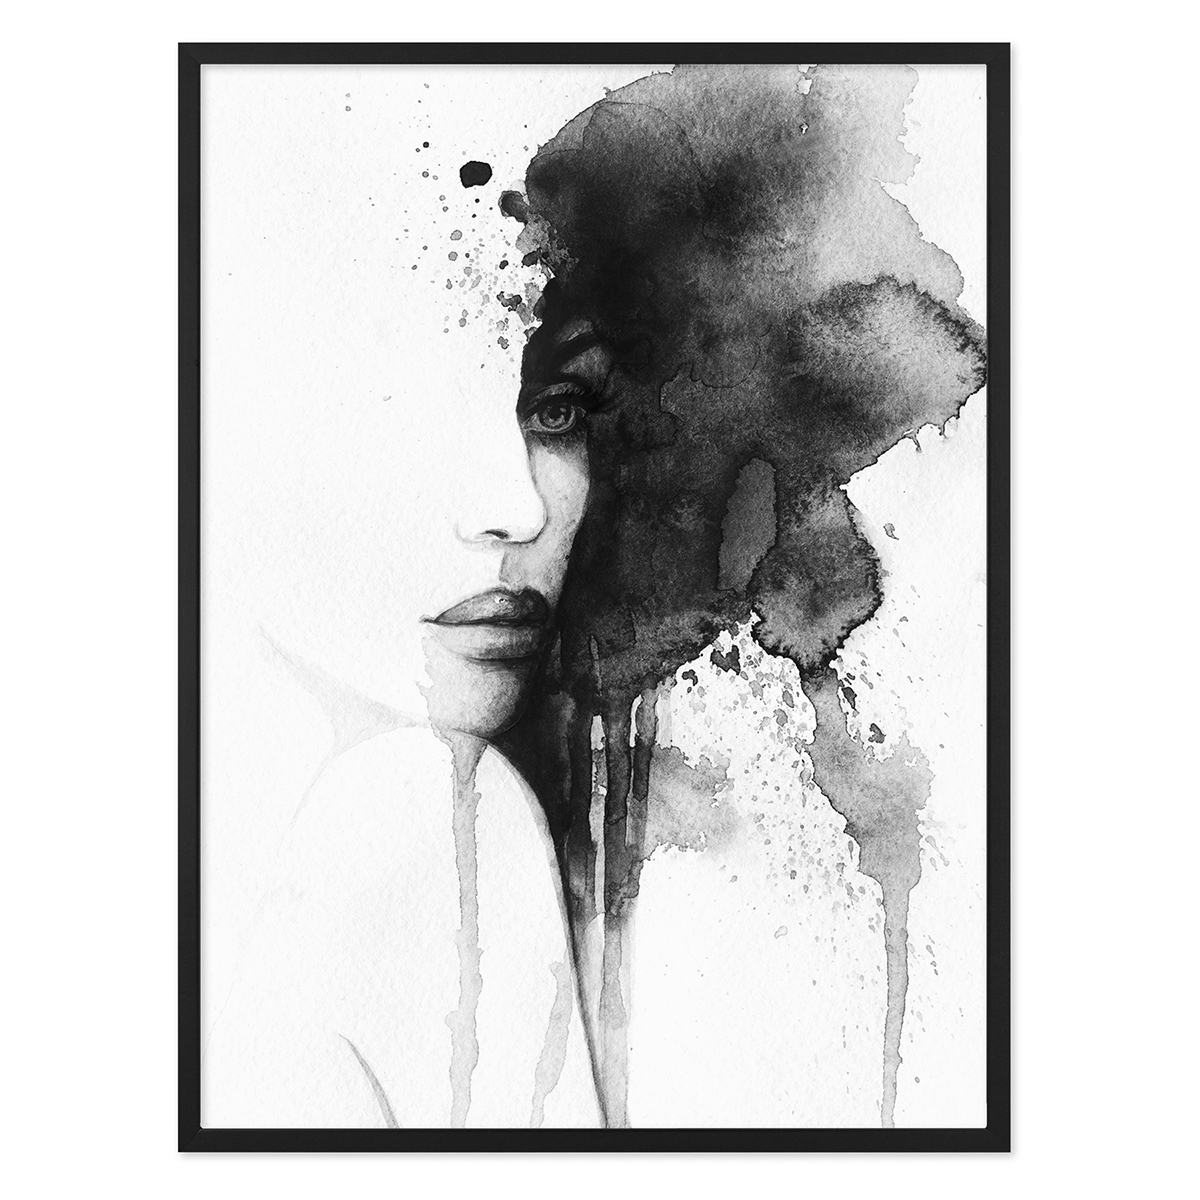 Design Poster Aquarell Frau 30x40 Cm Schwarz Weiss Abstrakt